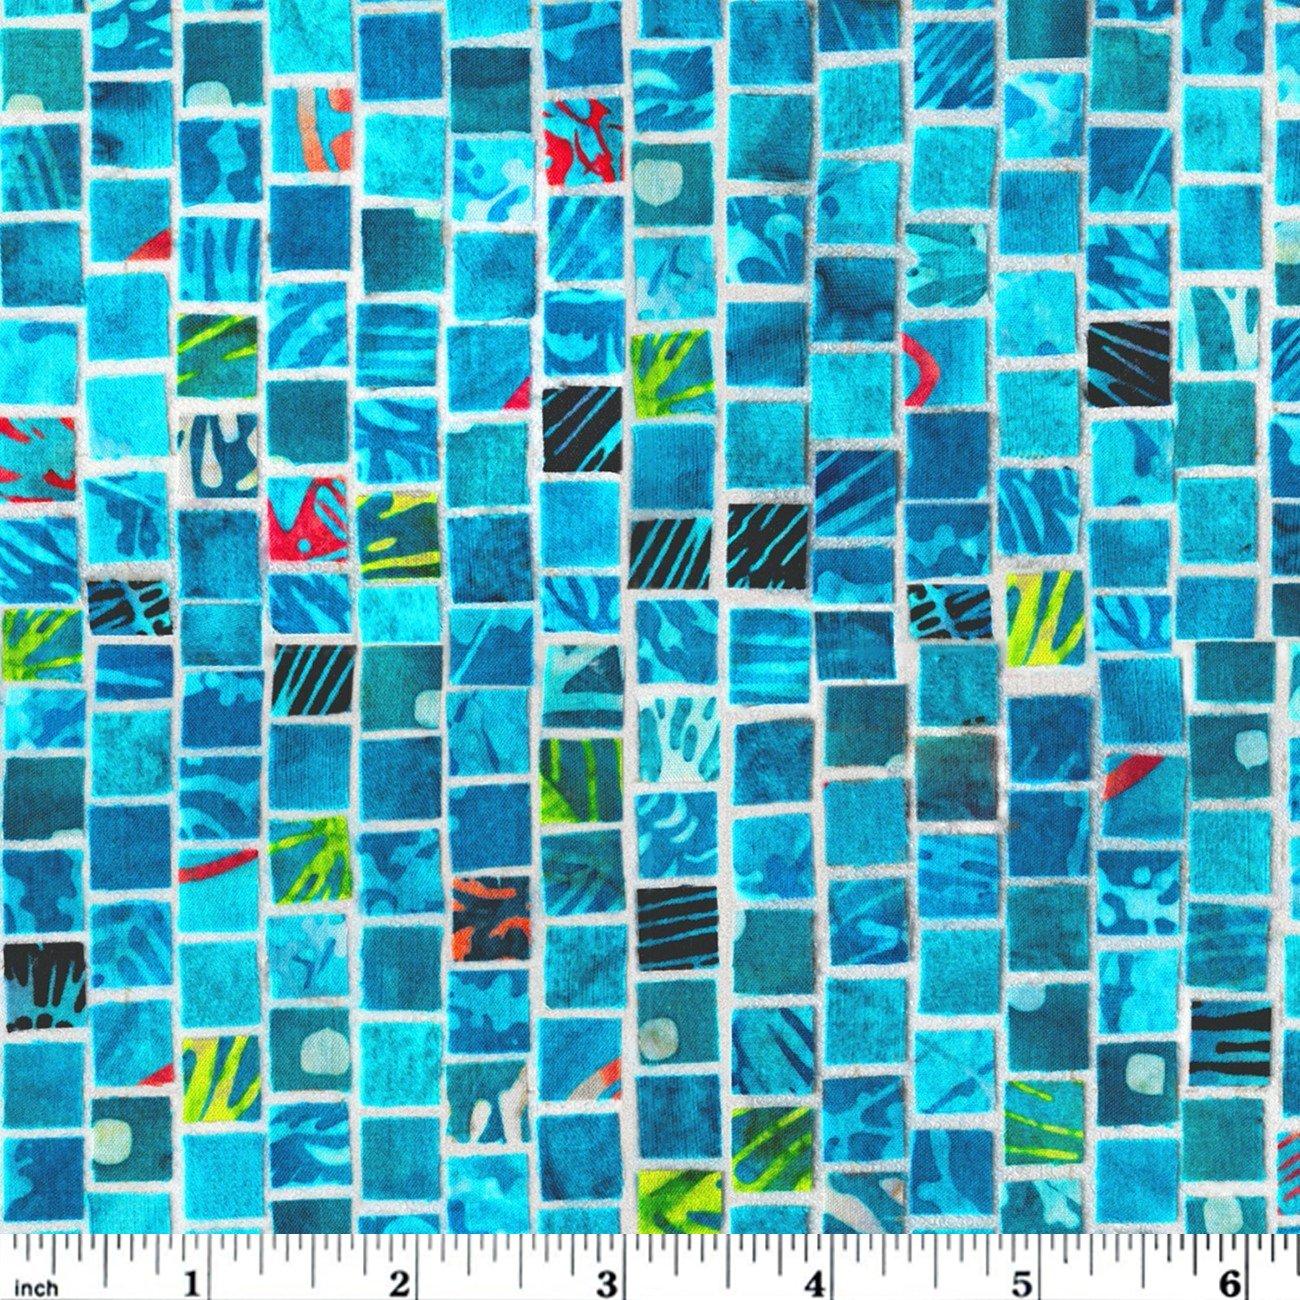 Hoffman Mosaic Masterpiece Digital - Aqua